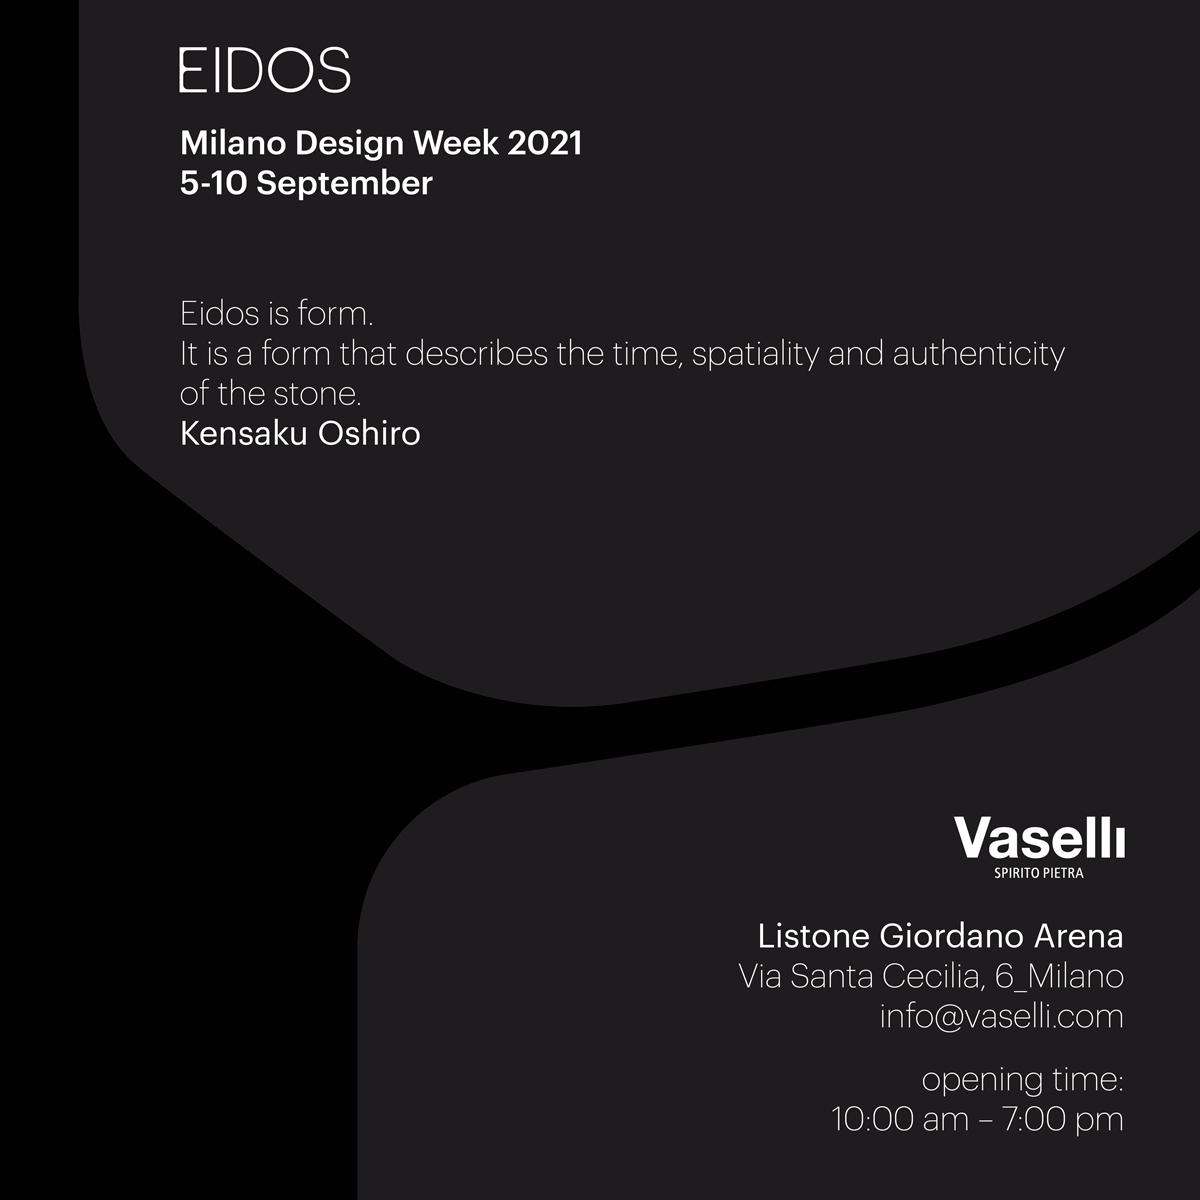 Save the Date | Milano Design Week 2021 | Vaselli